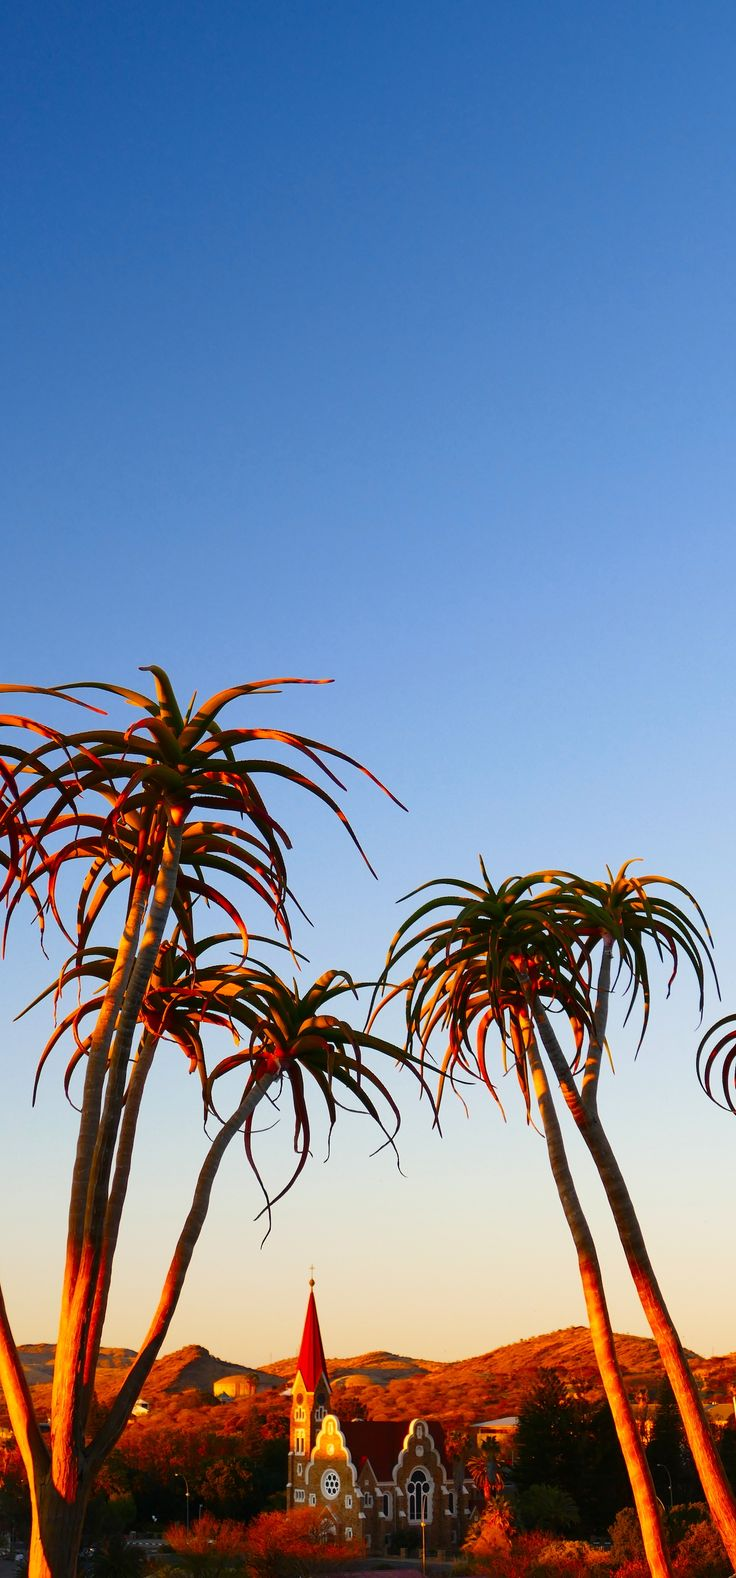 #City of #Sunsets #Travel #Namibia